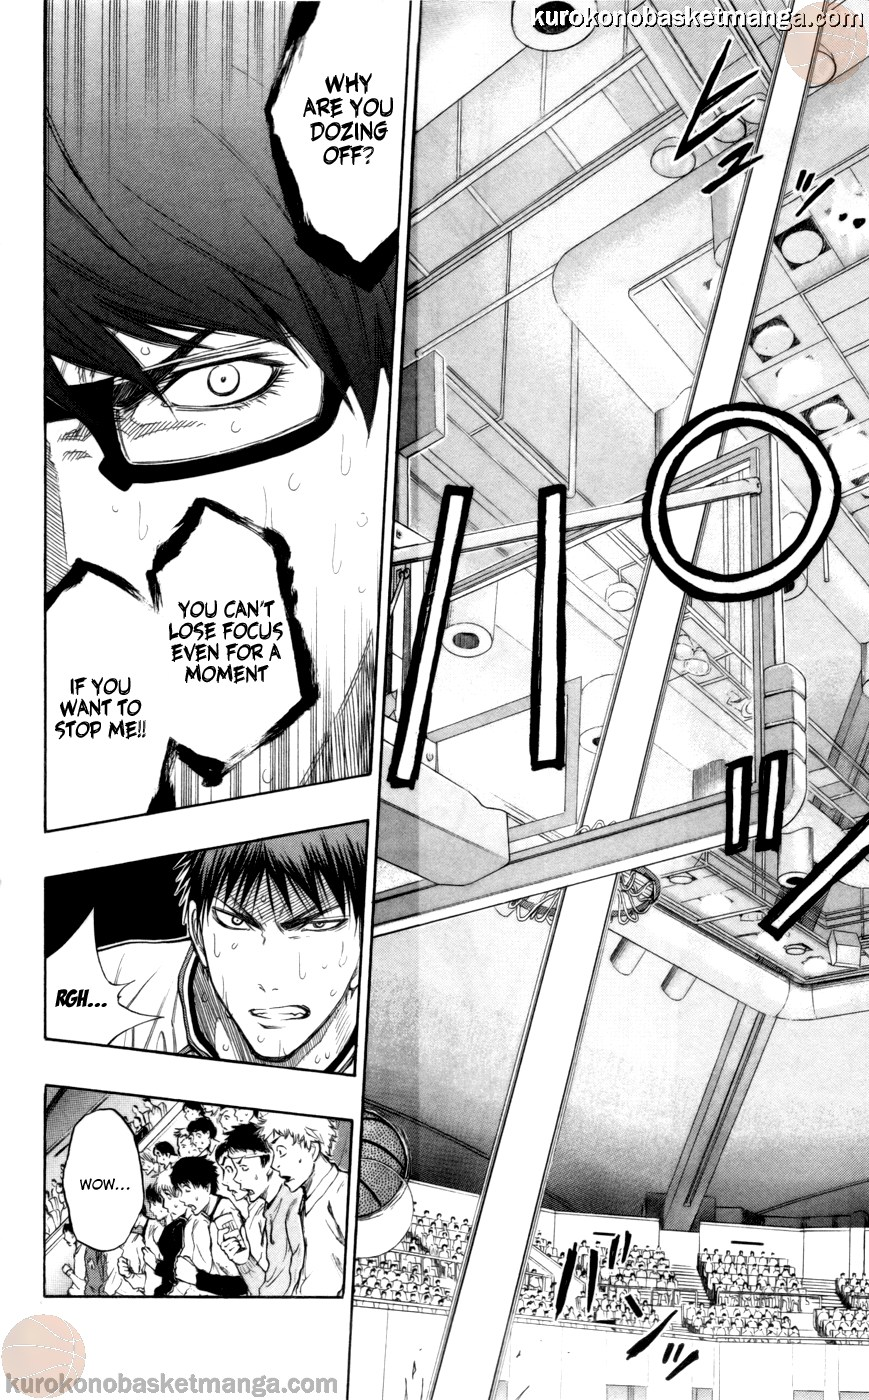 Kuroko no Basket Manga Chapter 88 - Image 20